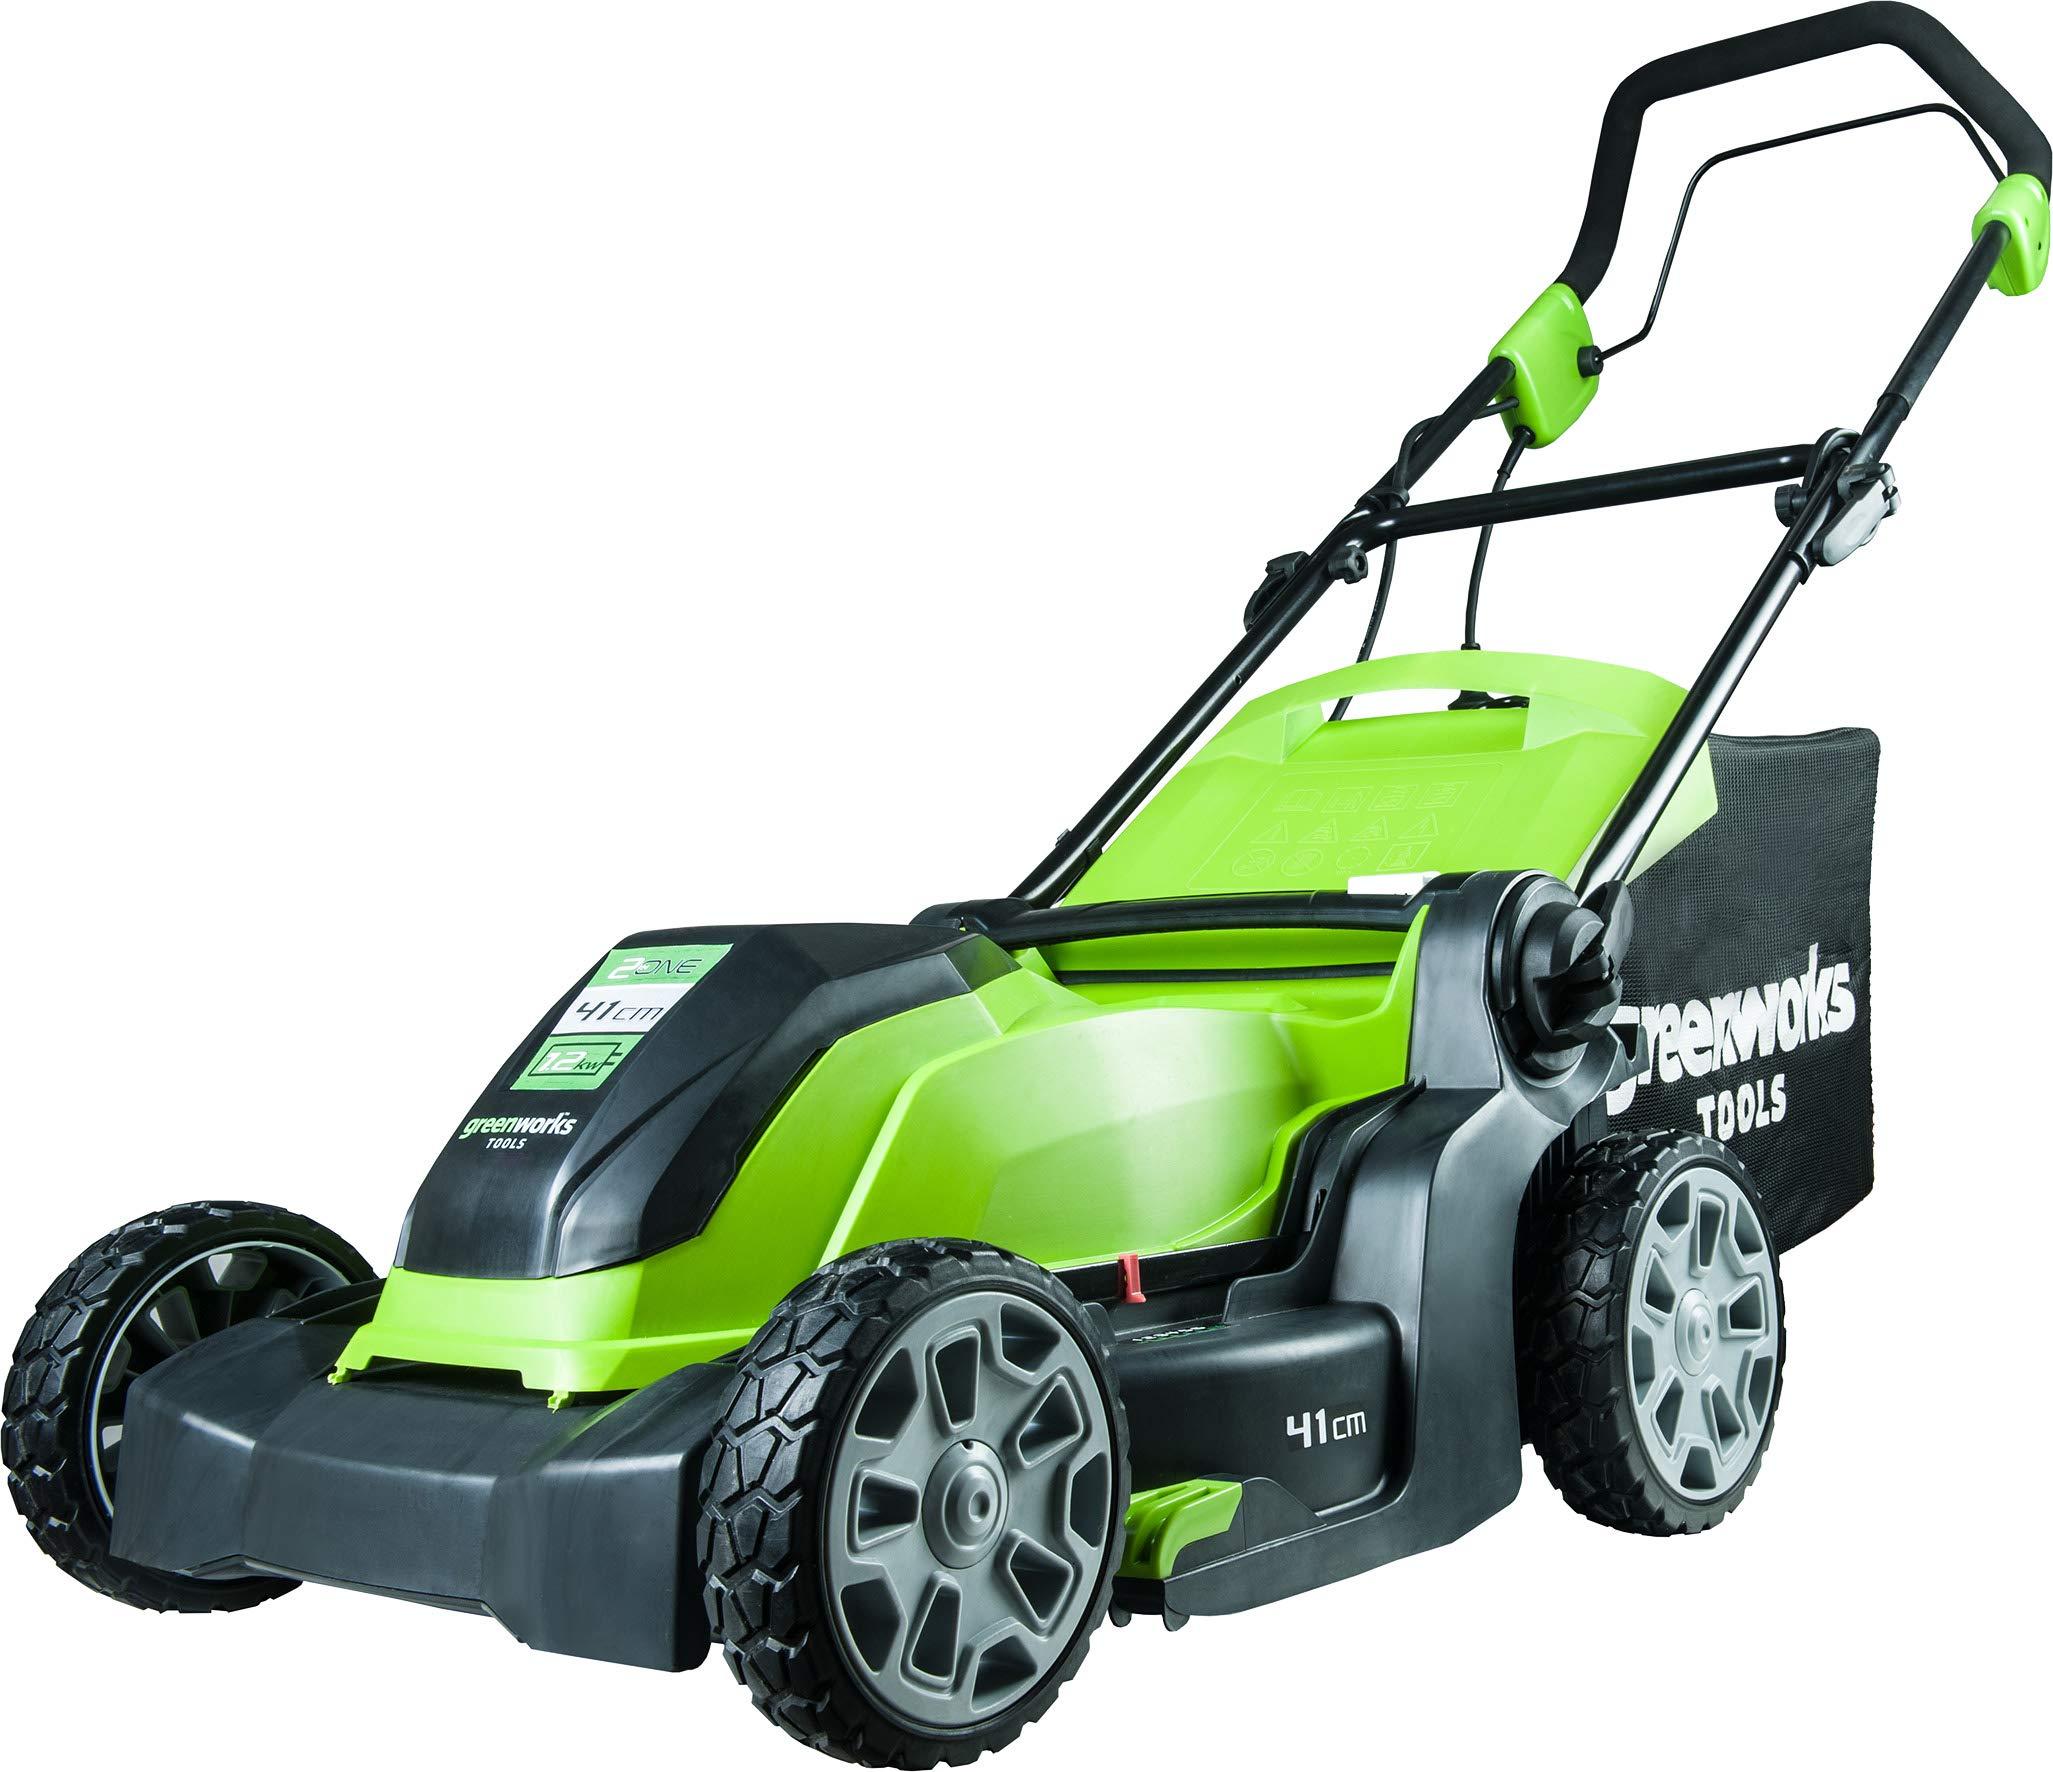 Greenworks-Elektro-Rasenmher-1200-Watt-41cm-Mulchkit-Elektromher-Mulcher